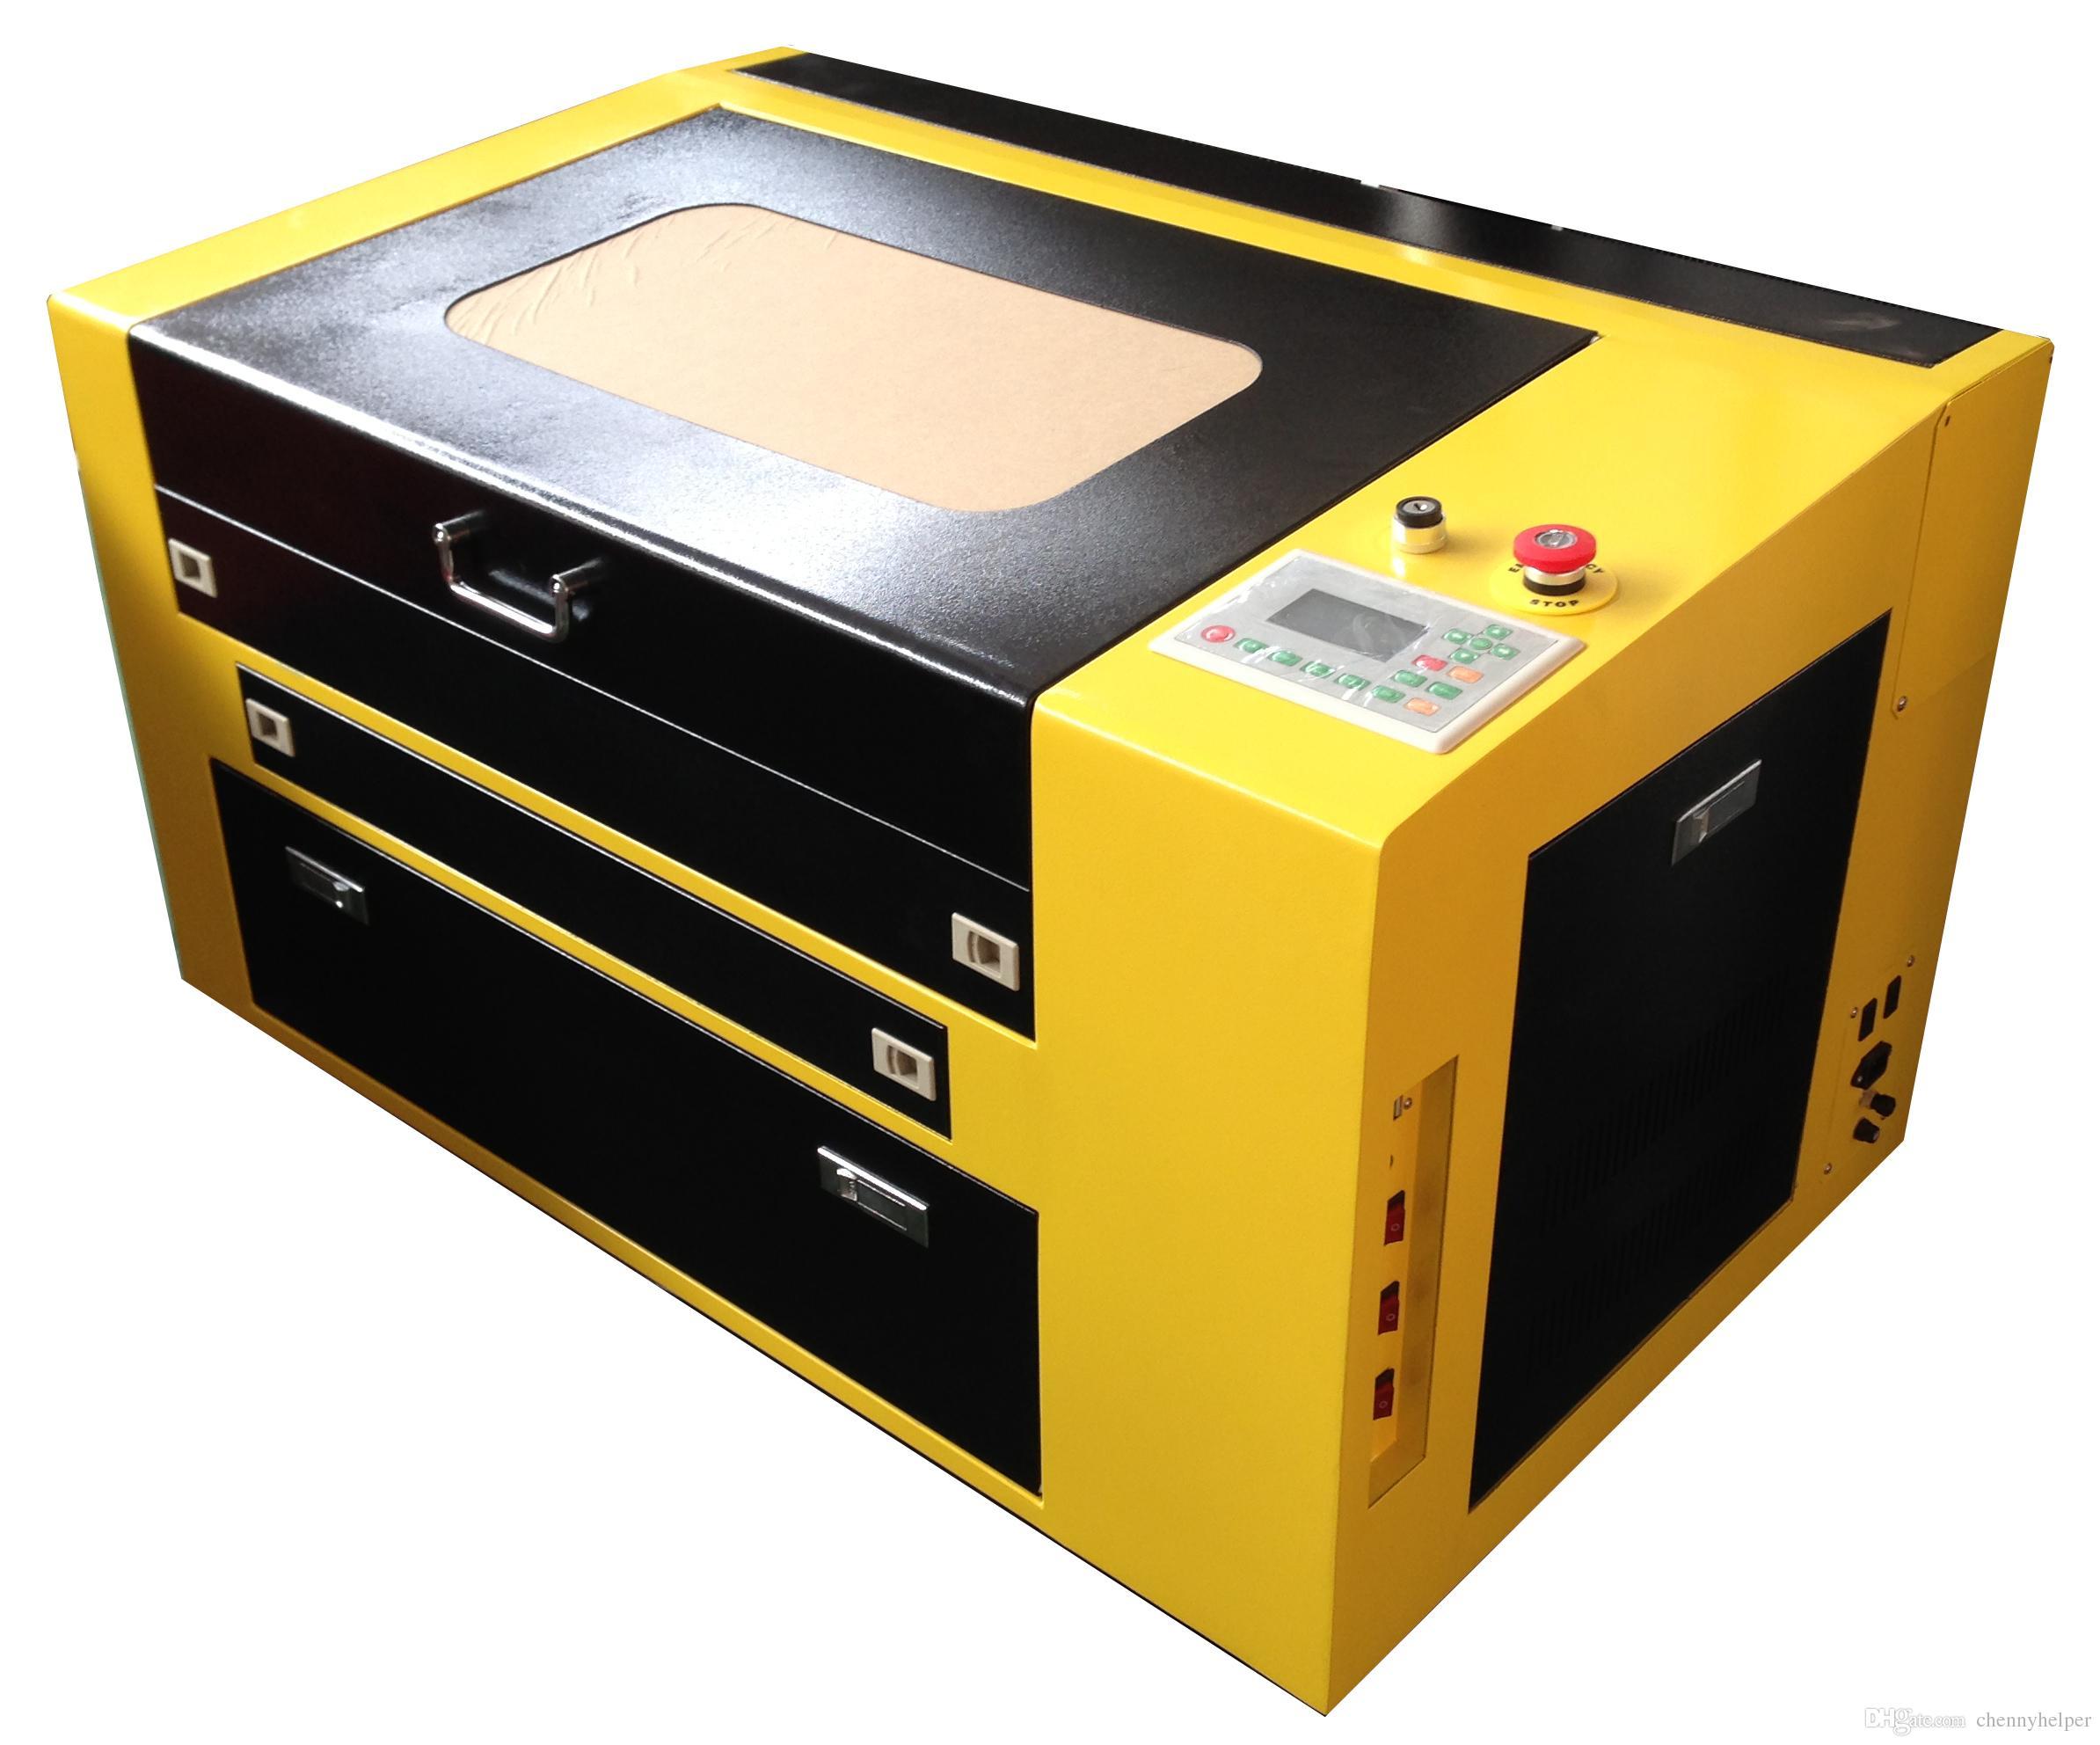 ZD-4060 60 واط 400x600 ملليمتر عالية الجودة co2 النقش بالليزر آلة قطع حفارة حفارة للخشب الرقائقي